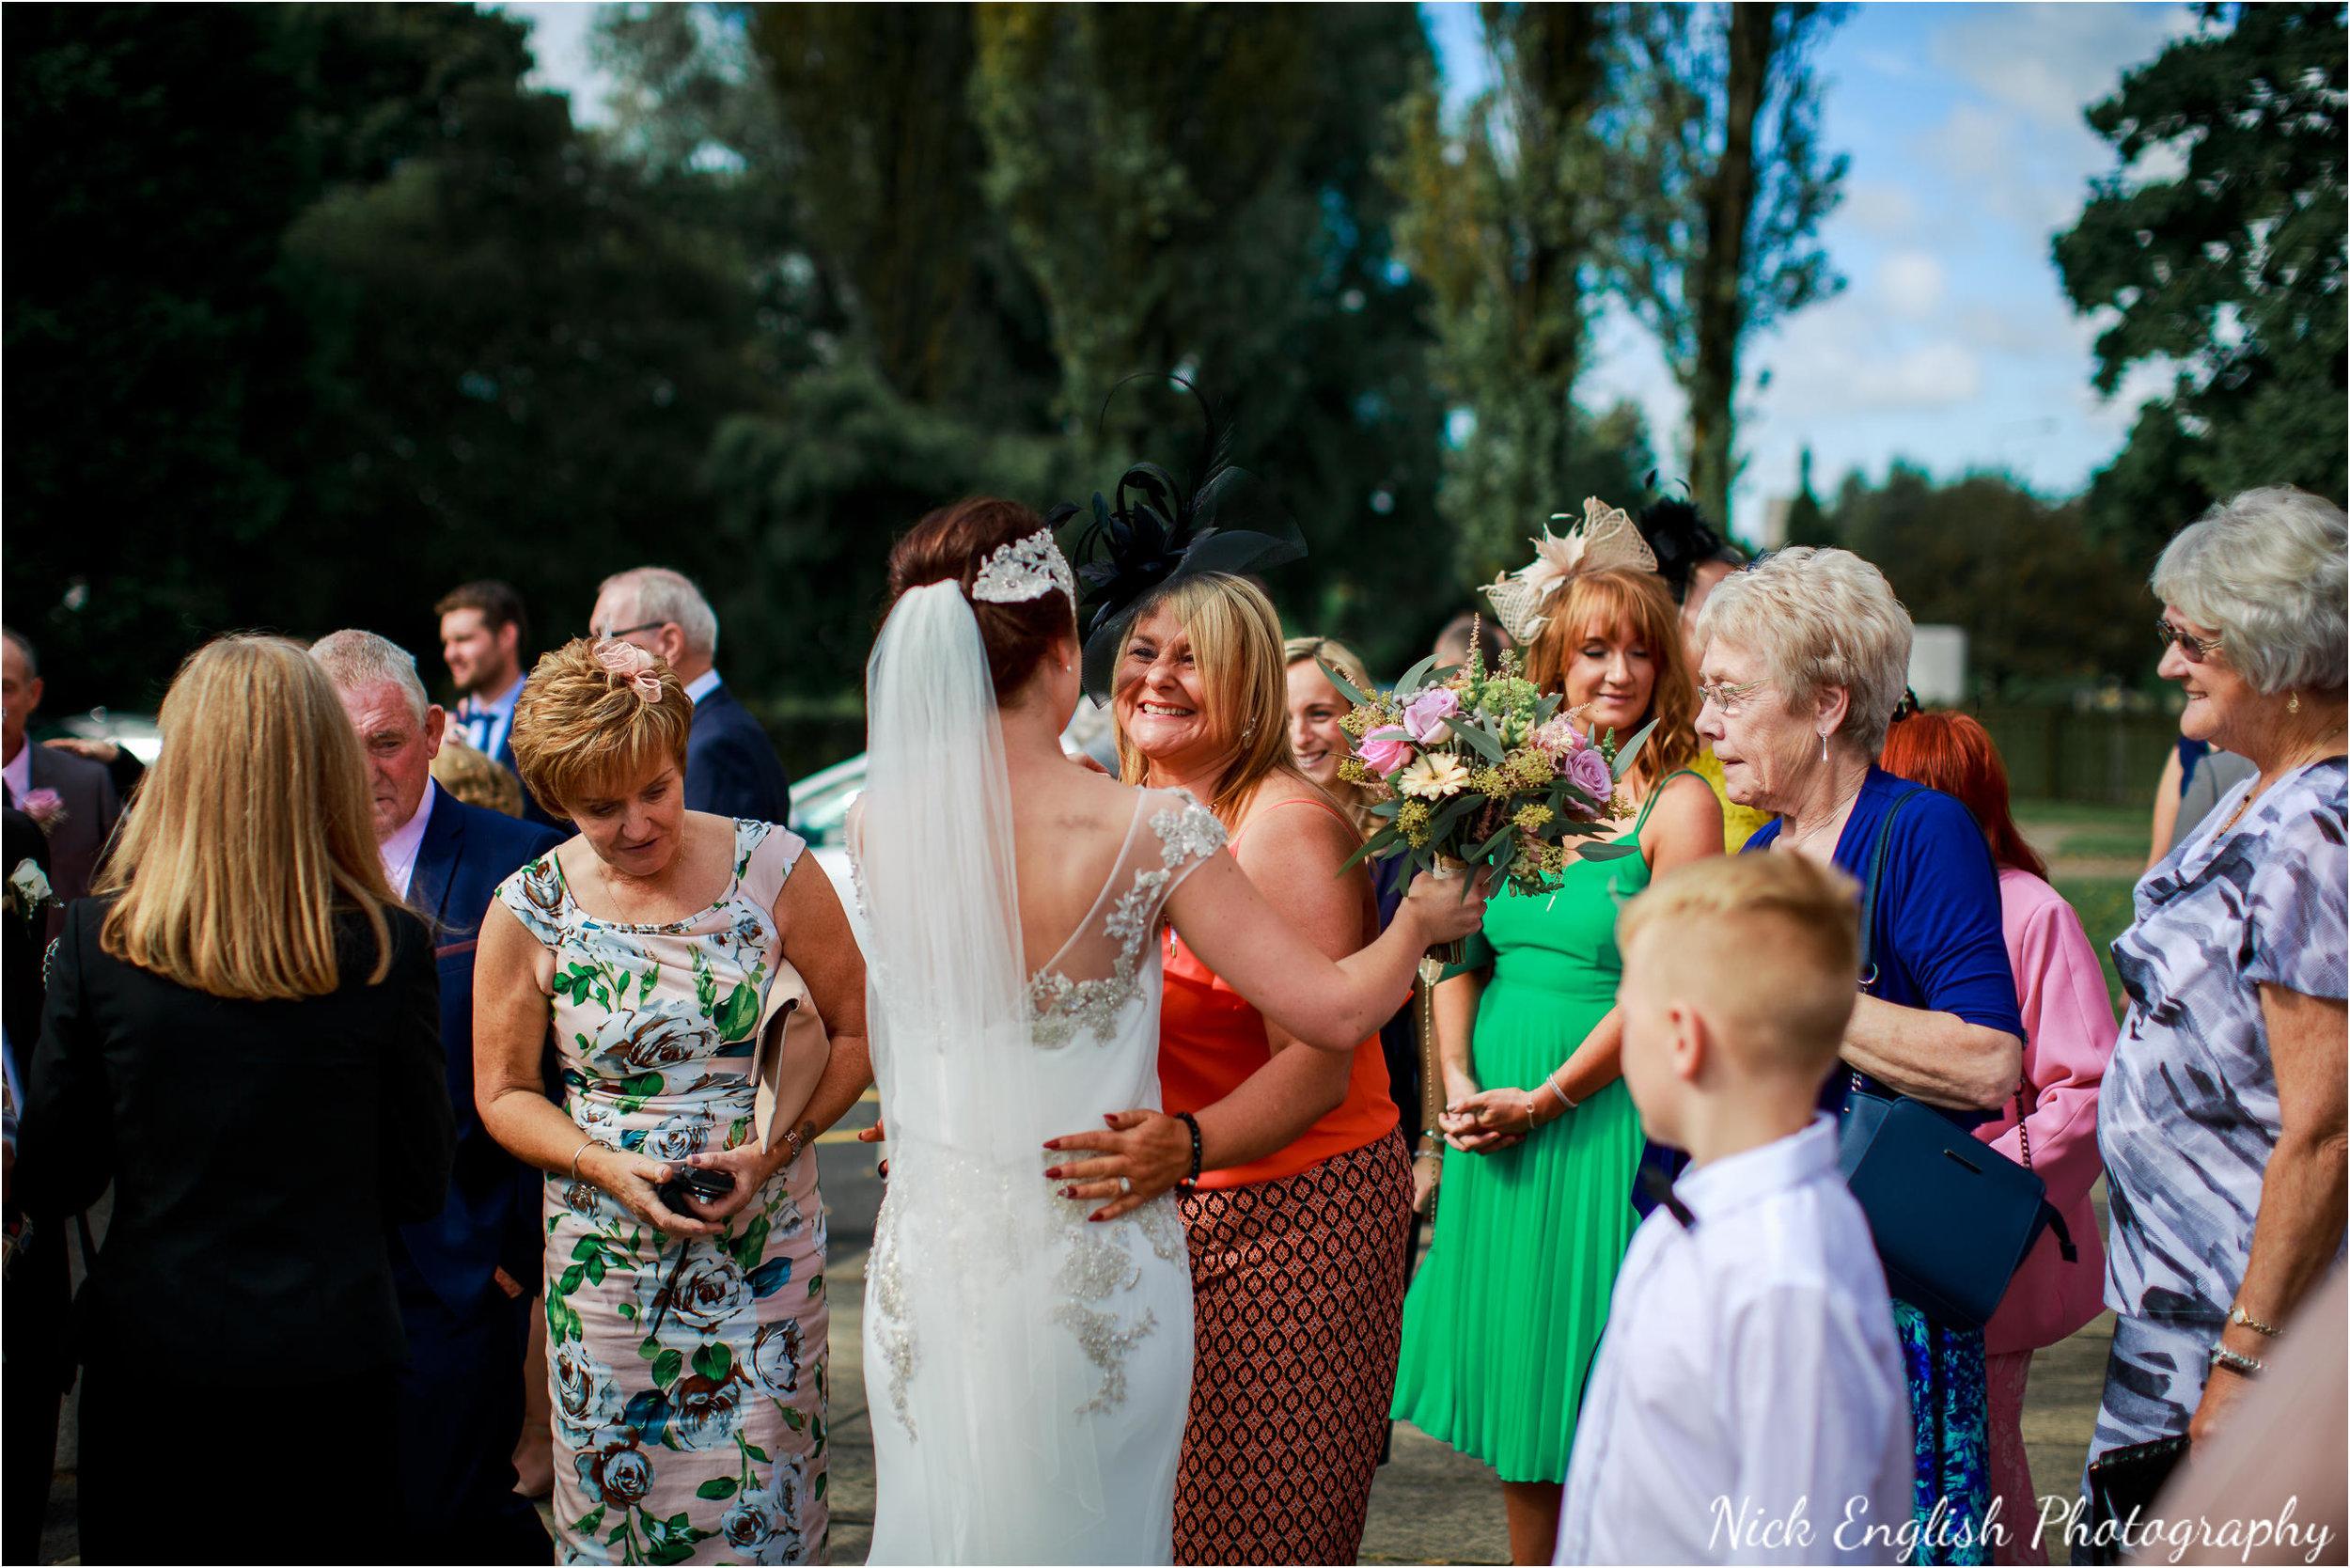 Stacey-Ash-Wedding-Photographs-Stanley-House-Preston-Lancashire-89.jpg